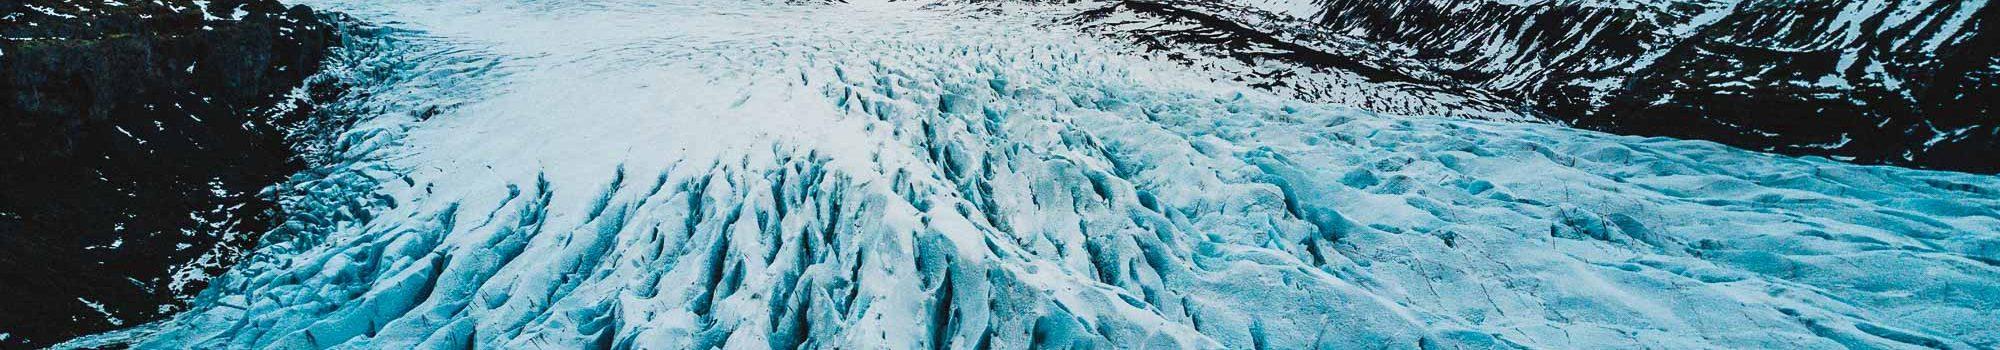 Vatnajokull National Park glacier